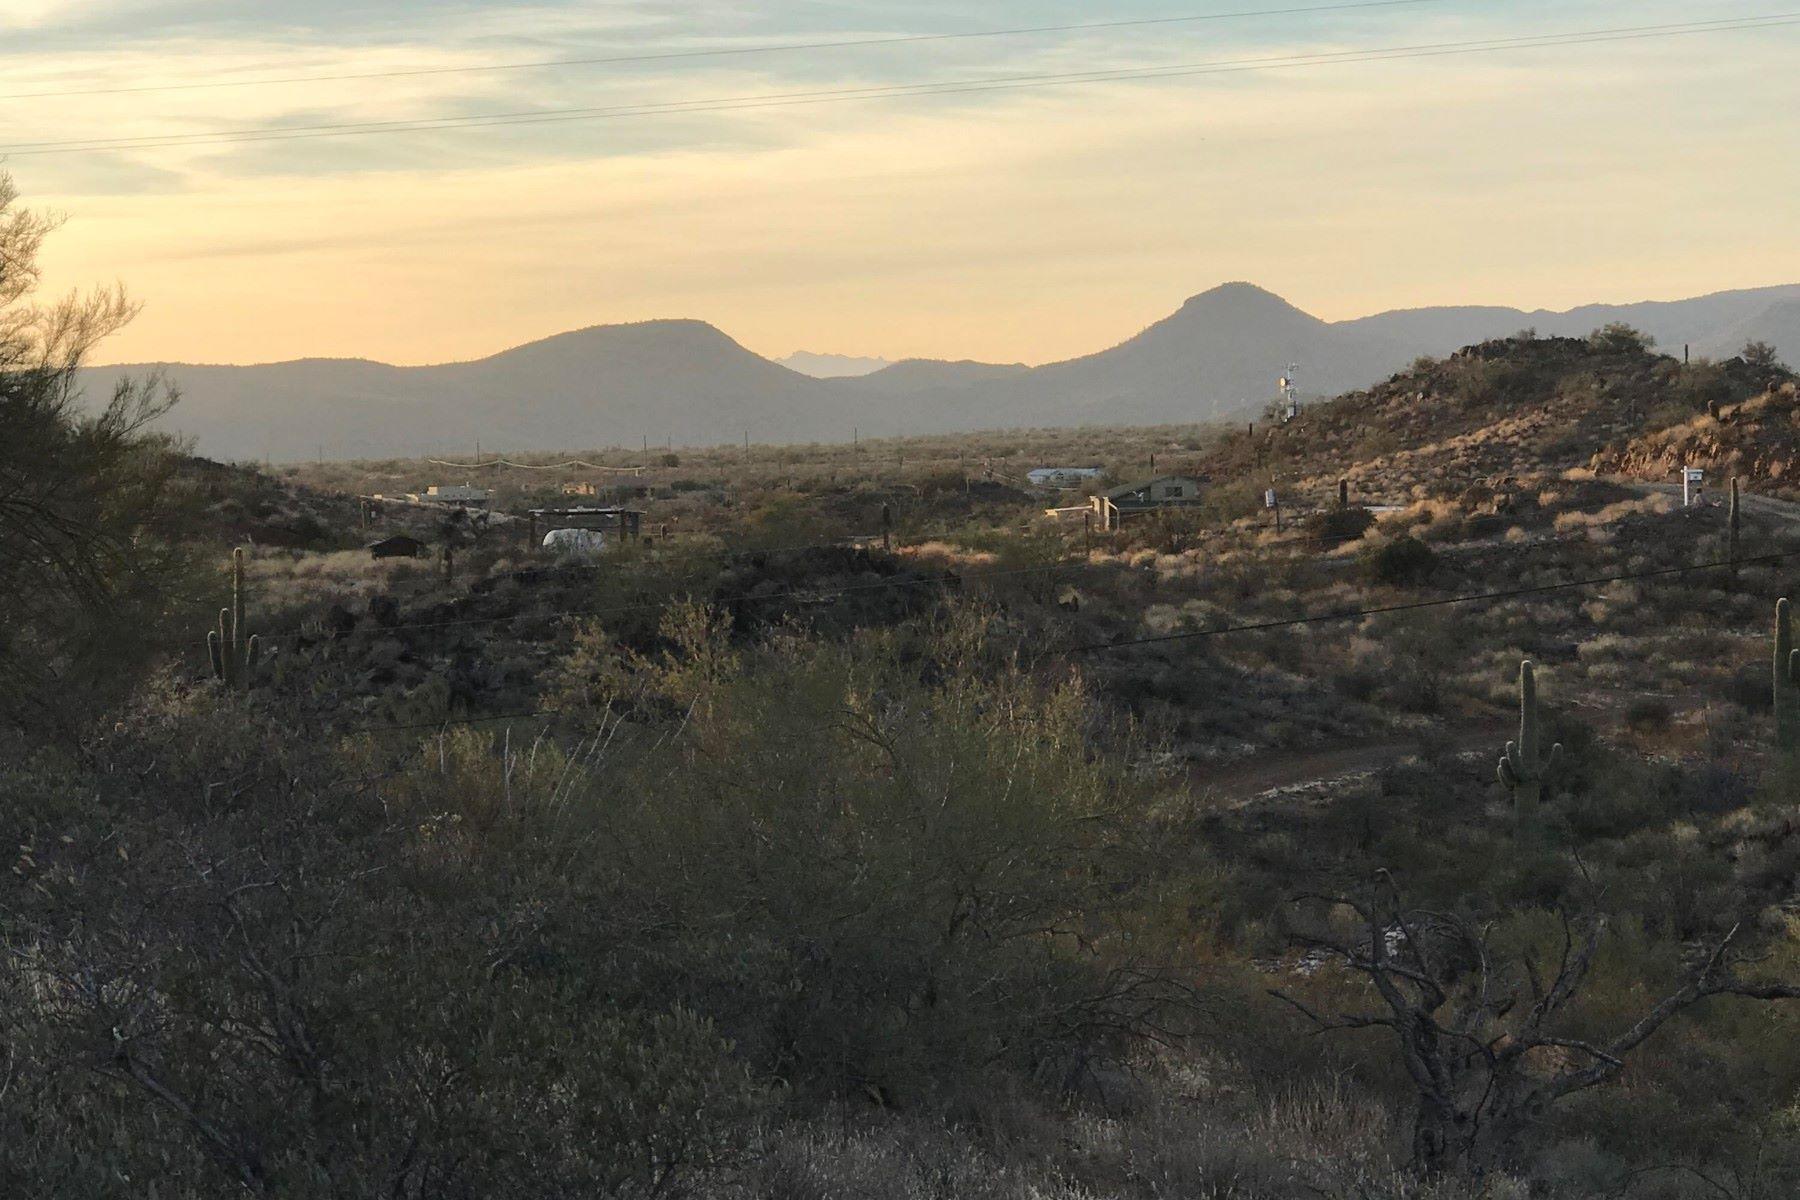 土地,用地 为 销售 在 Beautiful high desert 2.5 acres lot with amazing views 47XX3 N 37th Ave lot 31, 新河, 亚利桑那州, 85087 美国